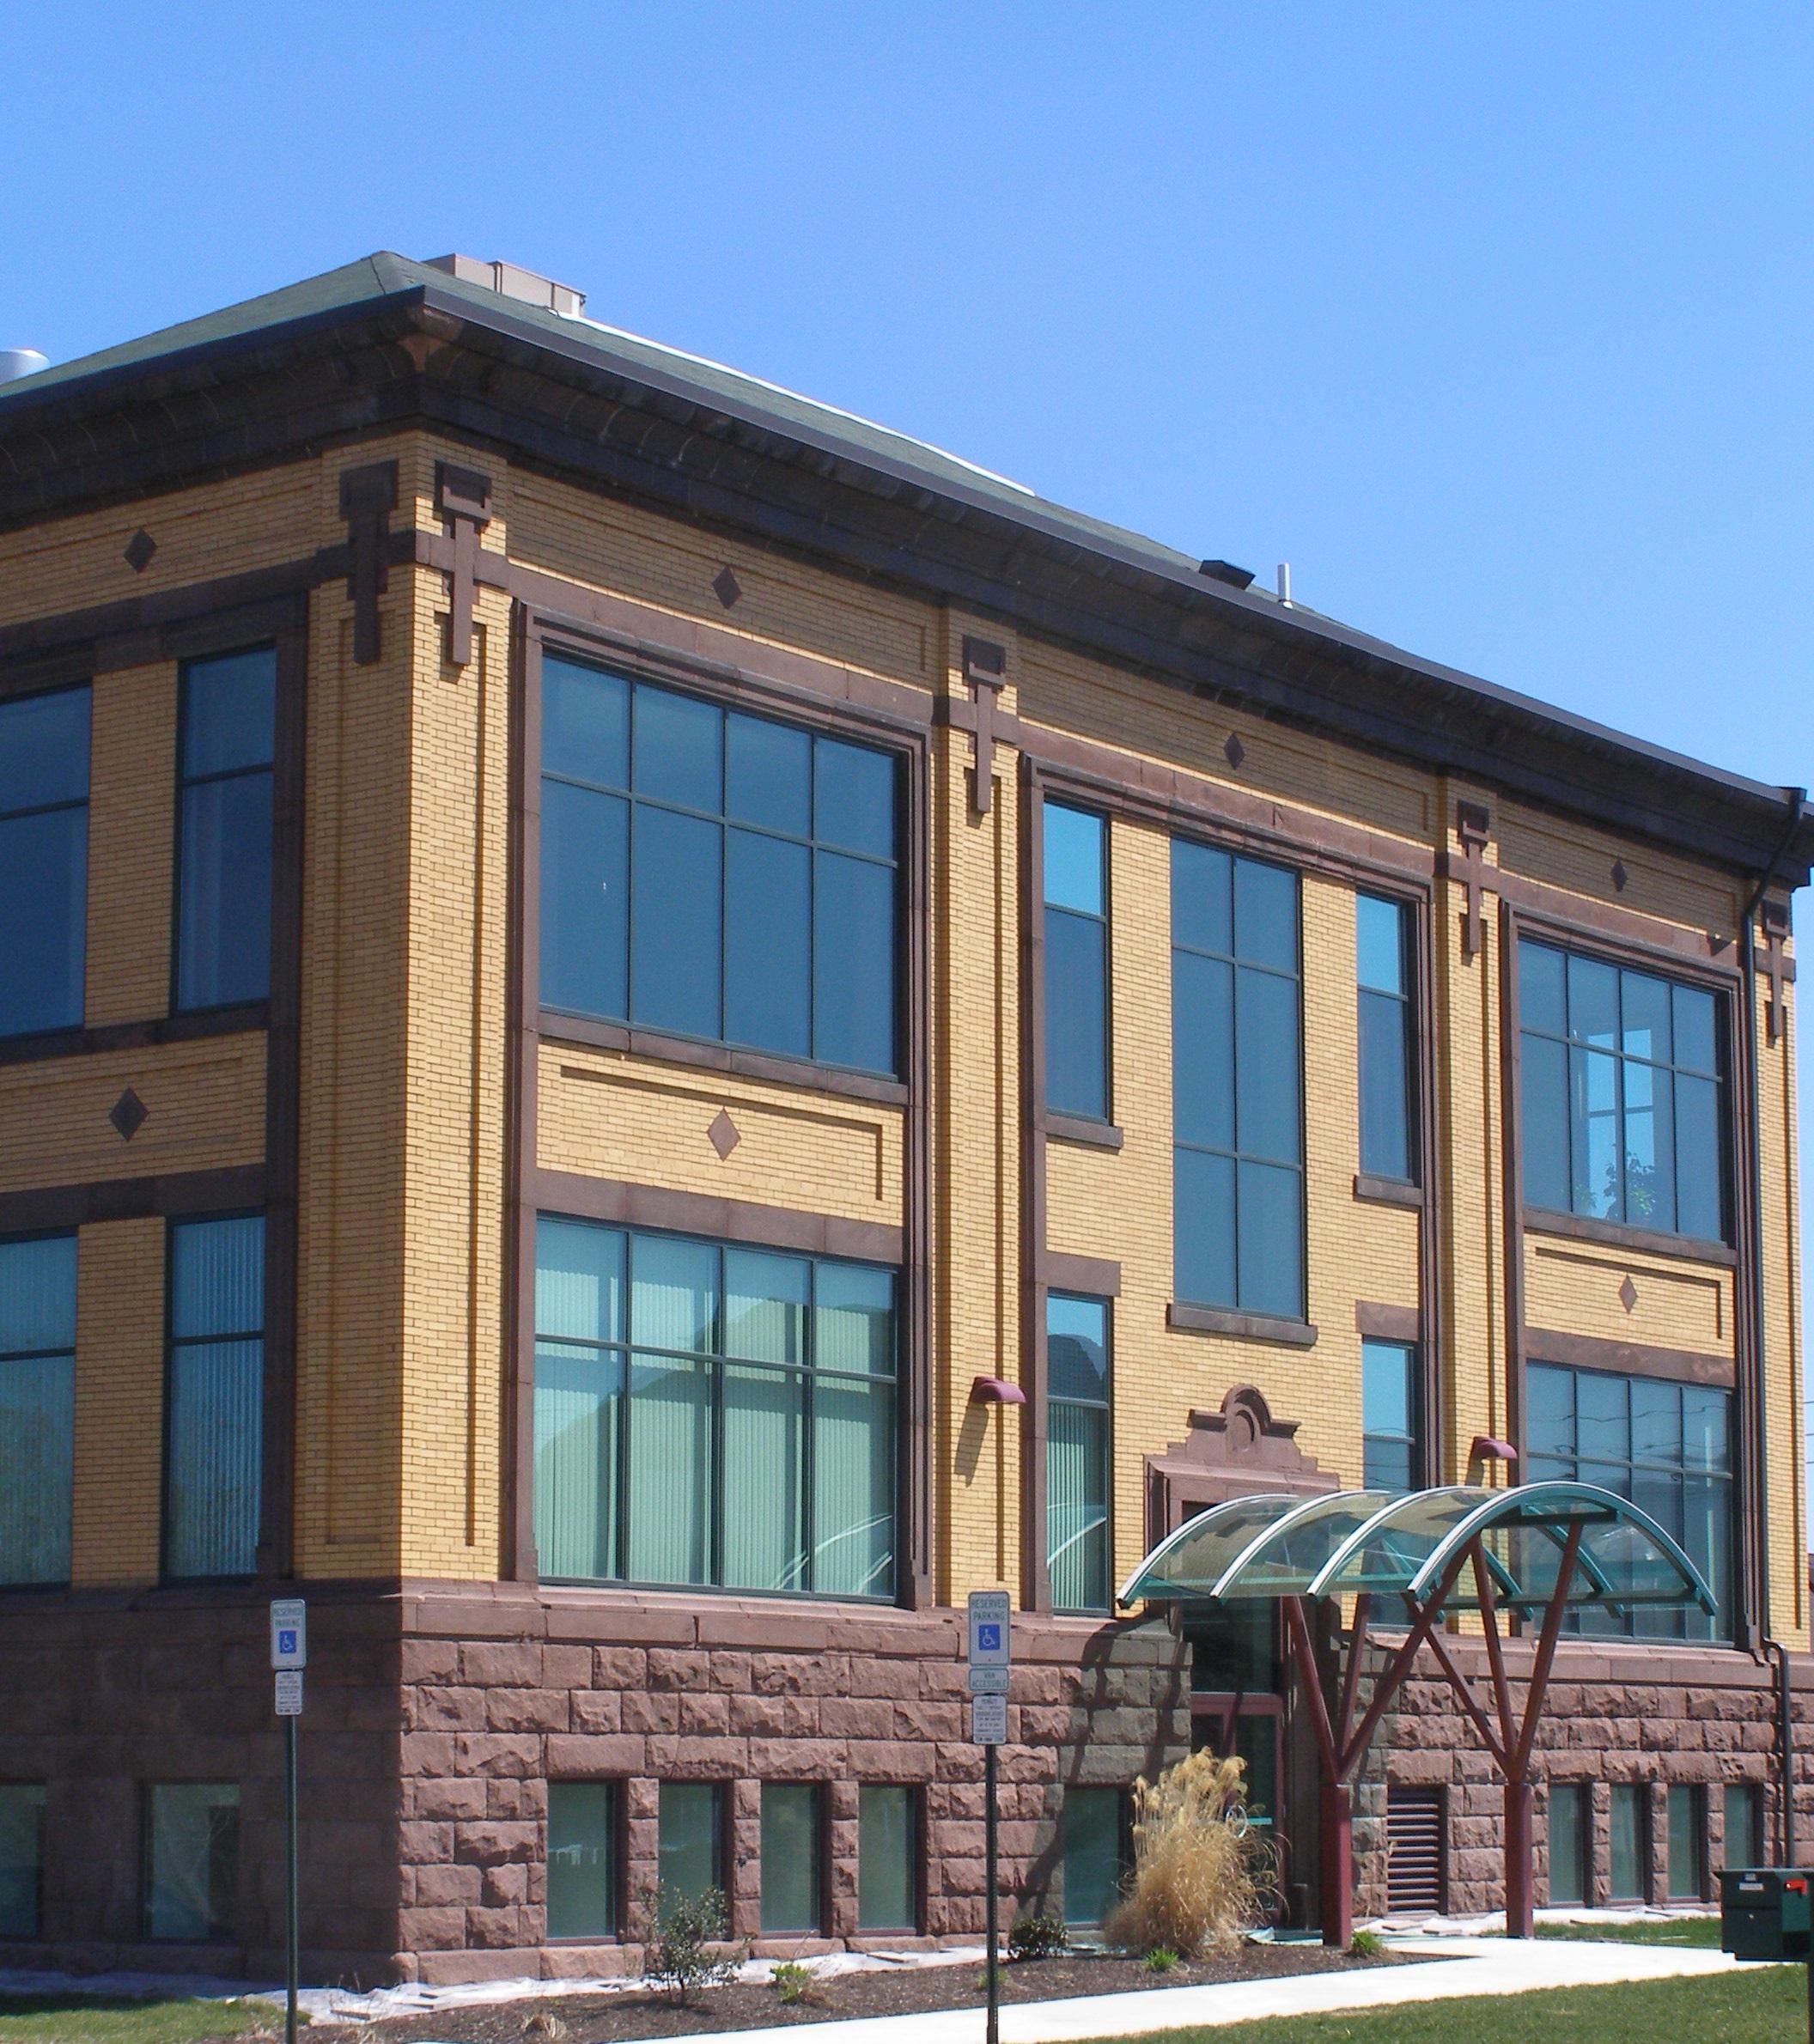 Maffett-Hill-Former-School-to-New-Office-Complex.jpg